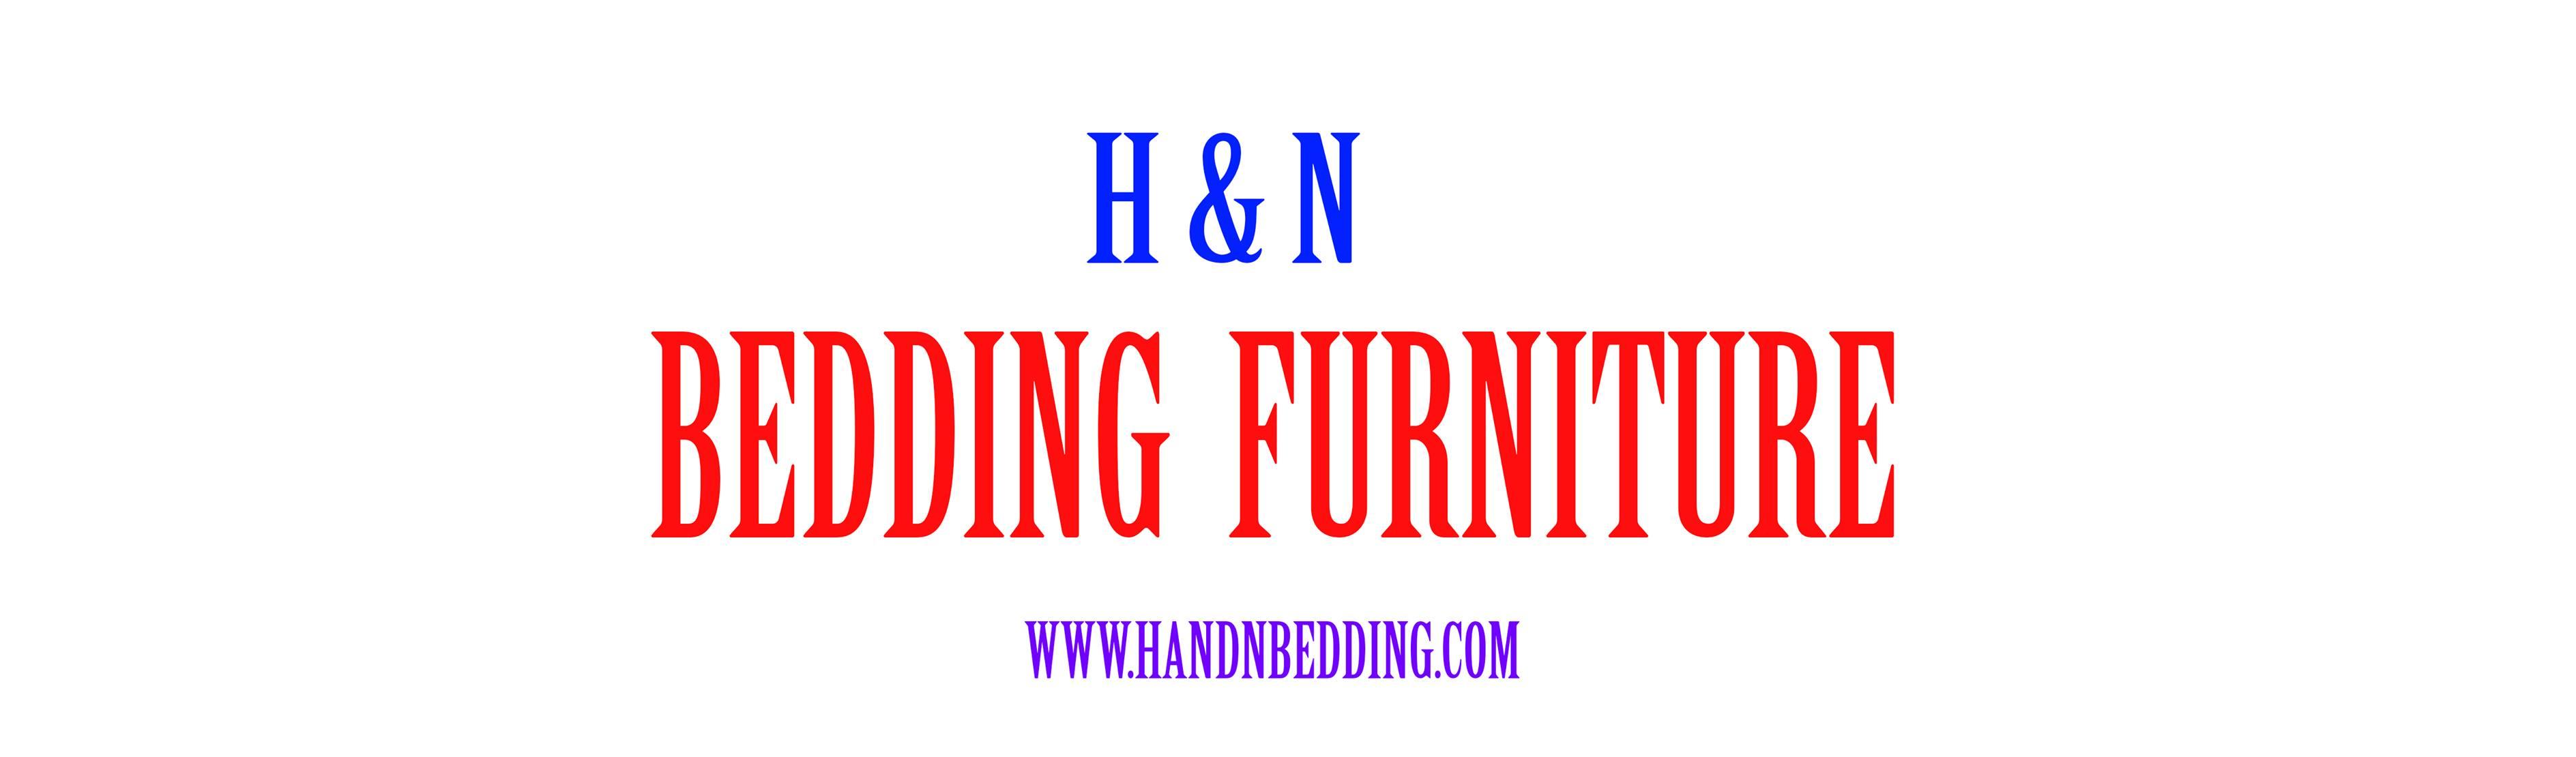 H&N Bedding Furniture Corp